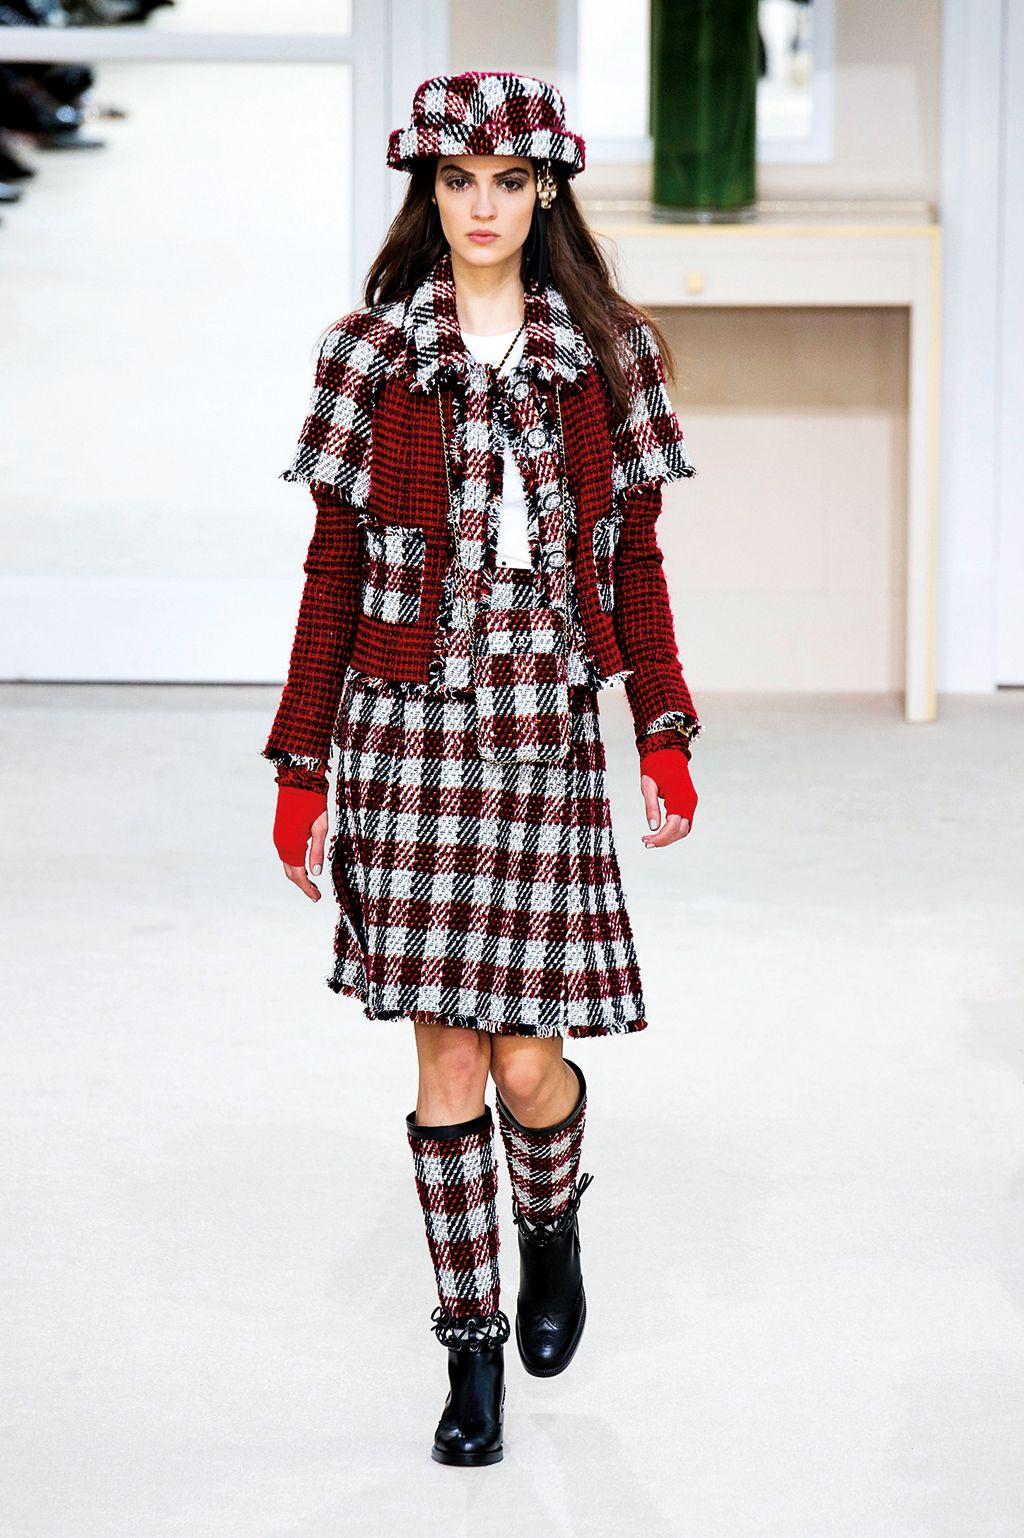 951a2b068 https   www.elle.com es moda compras-elle news g793173 zapatos ...